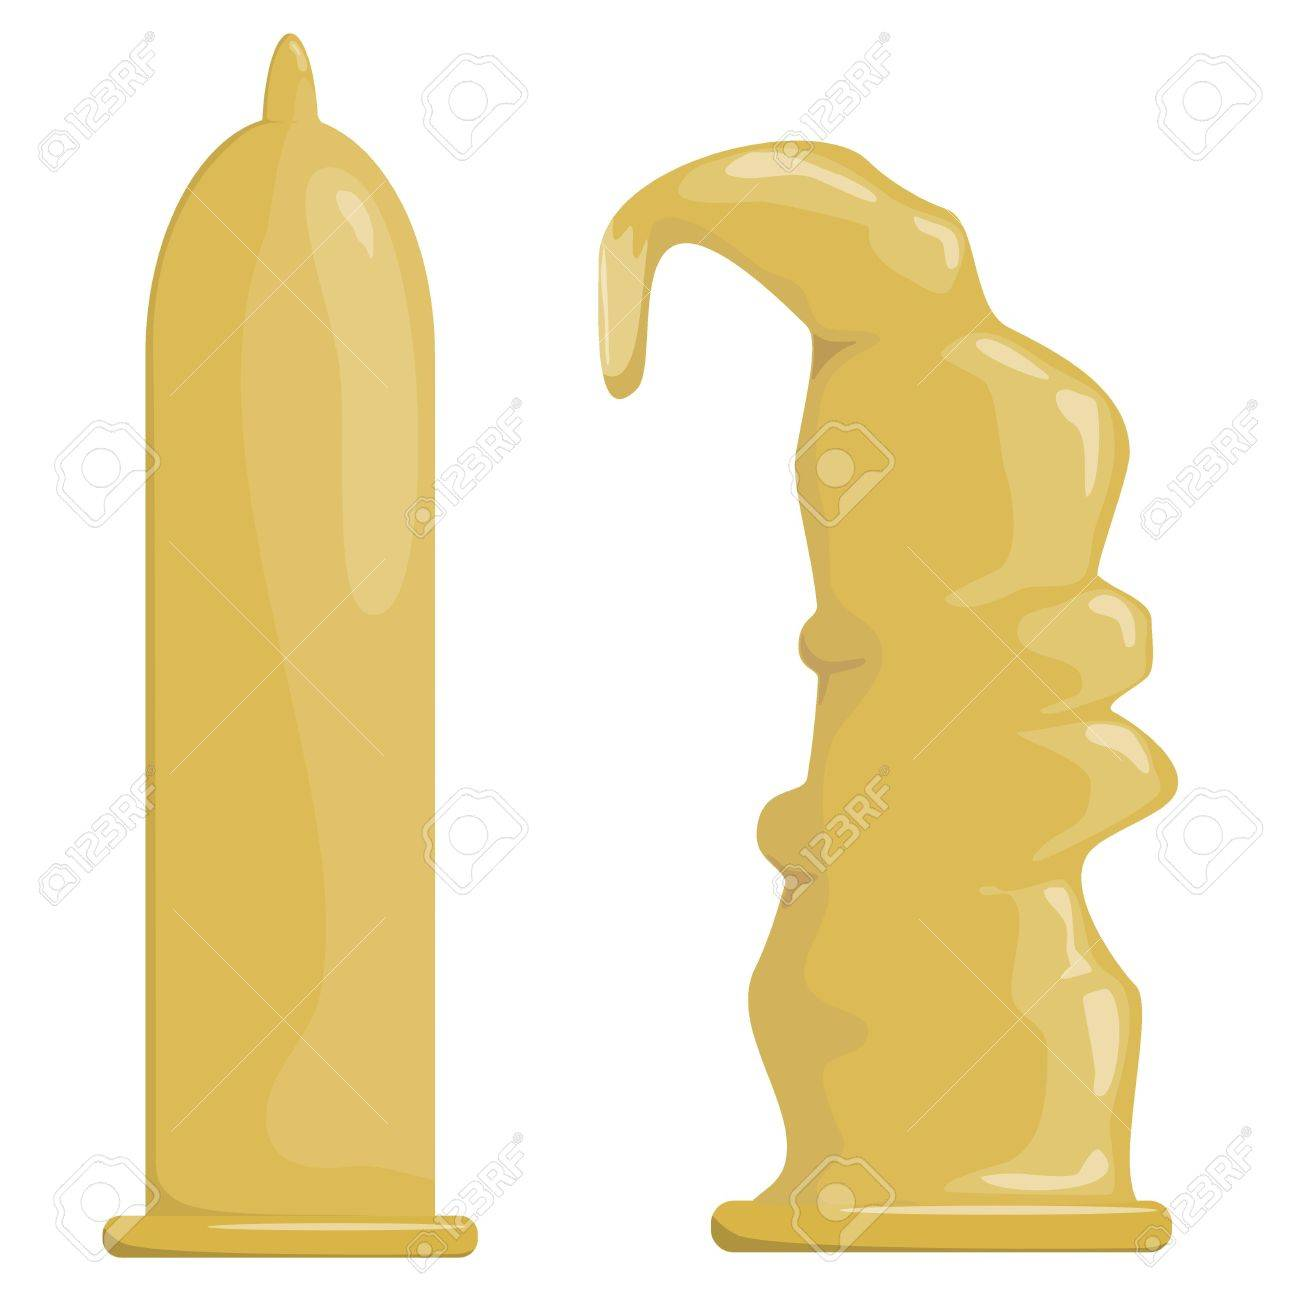 Condoms Stock Vector - 14351956